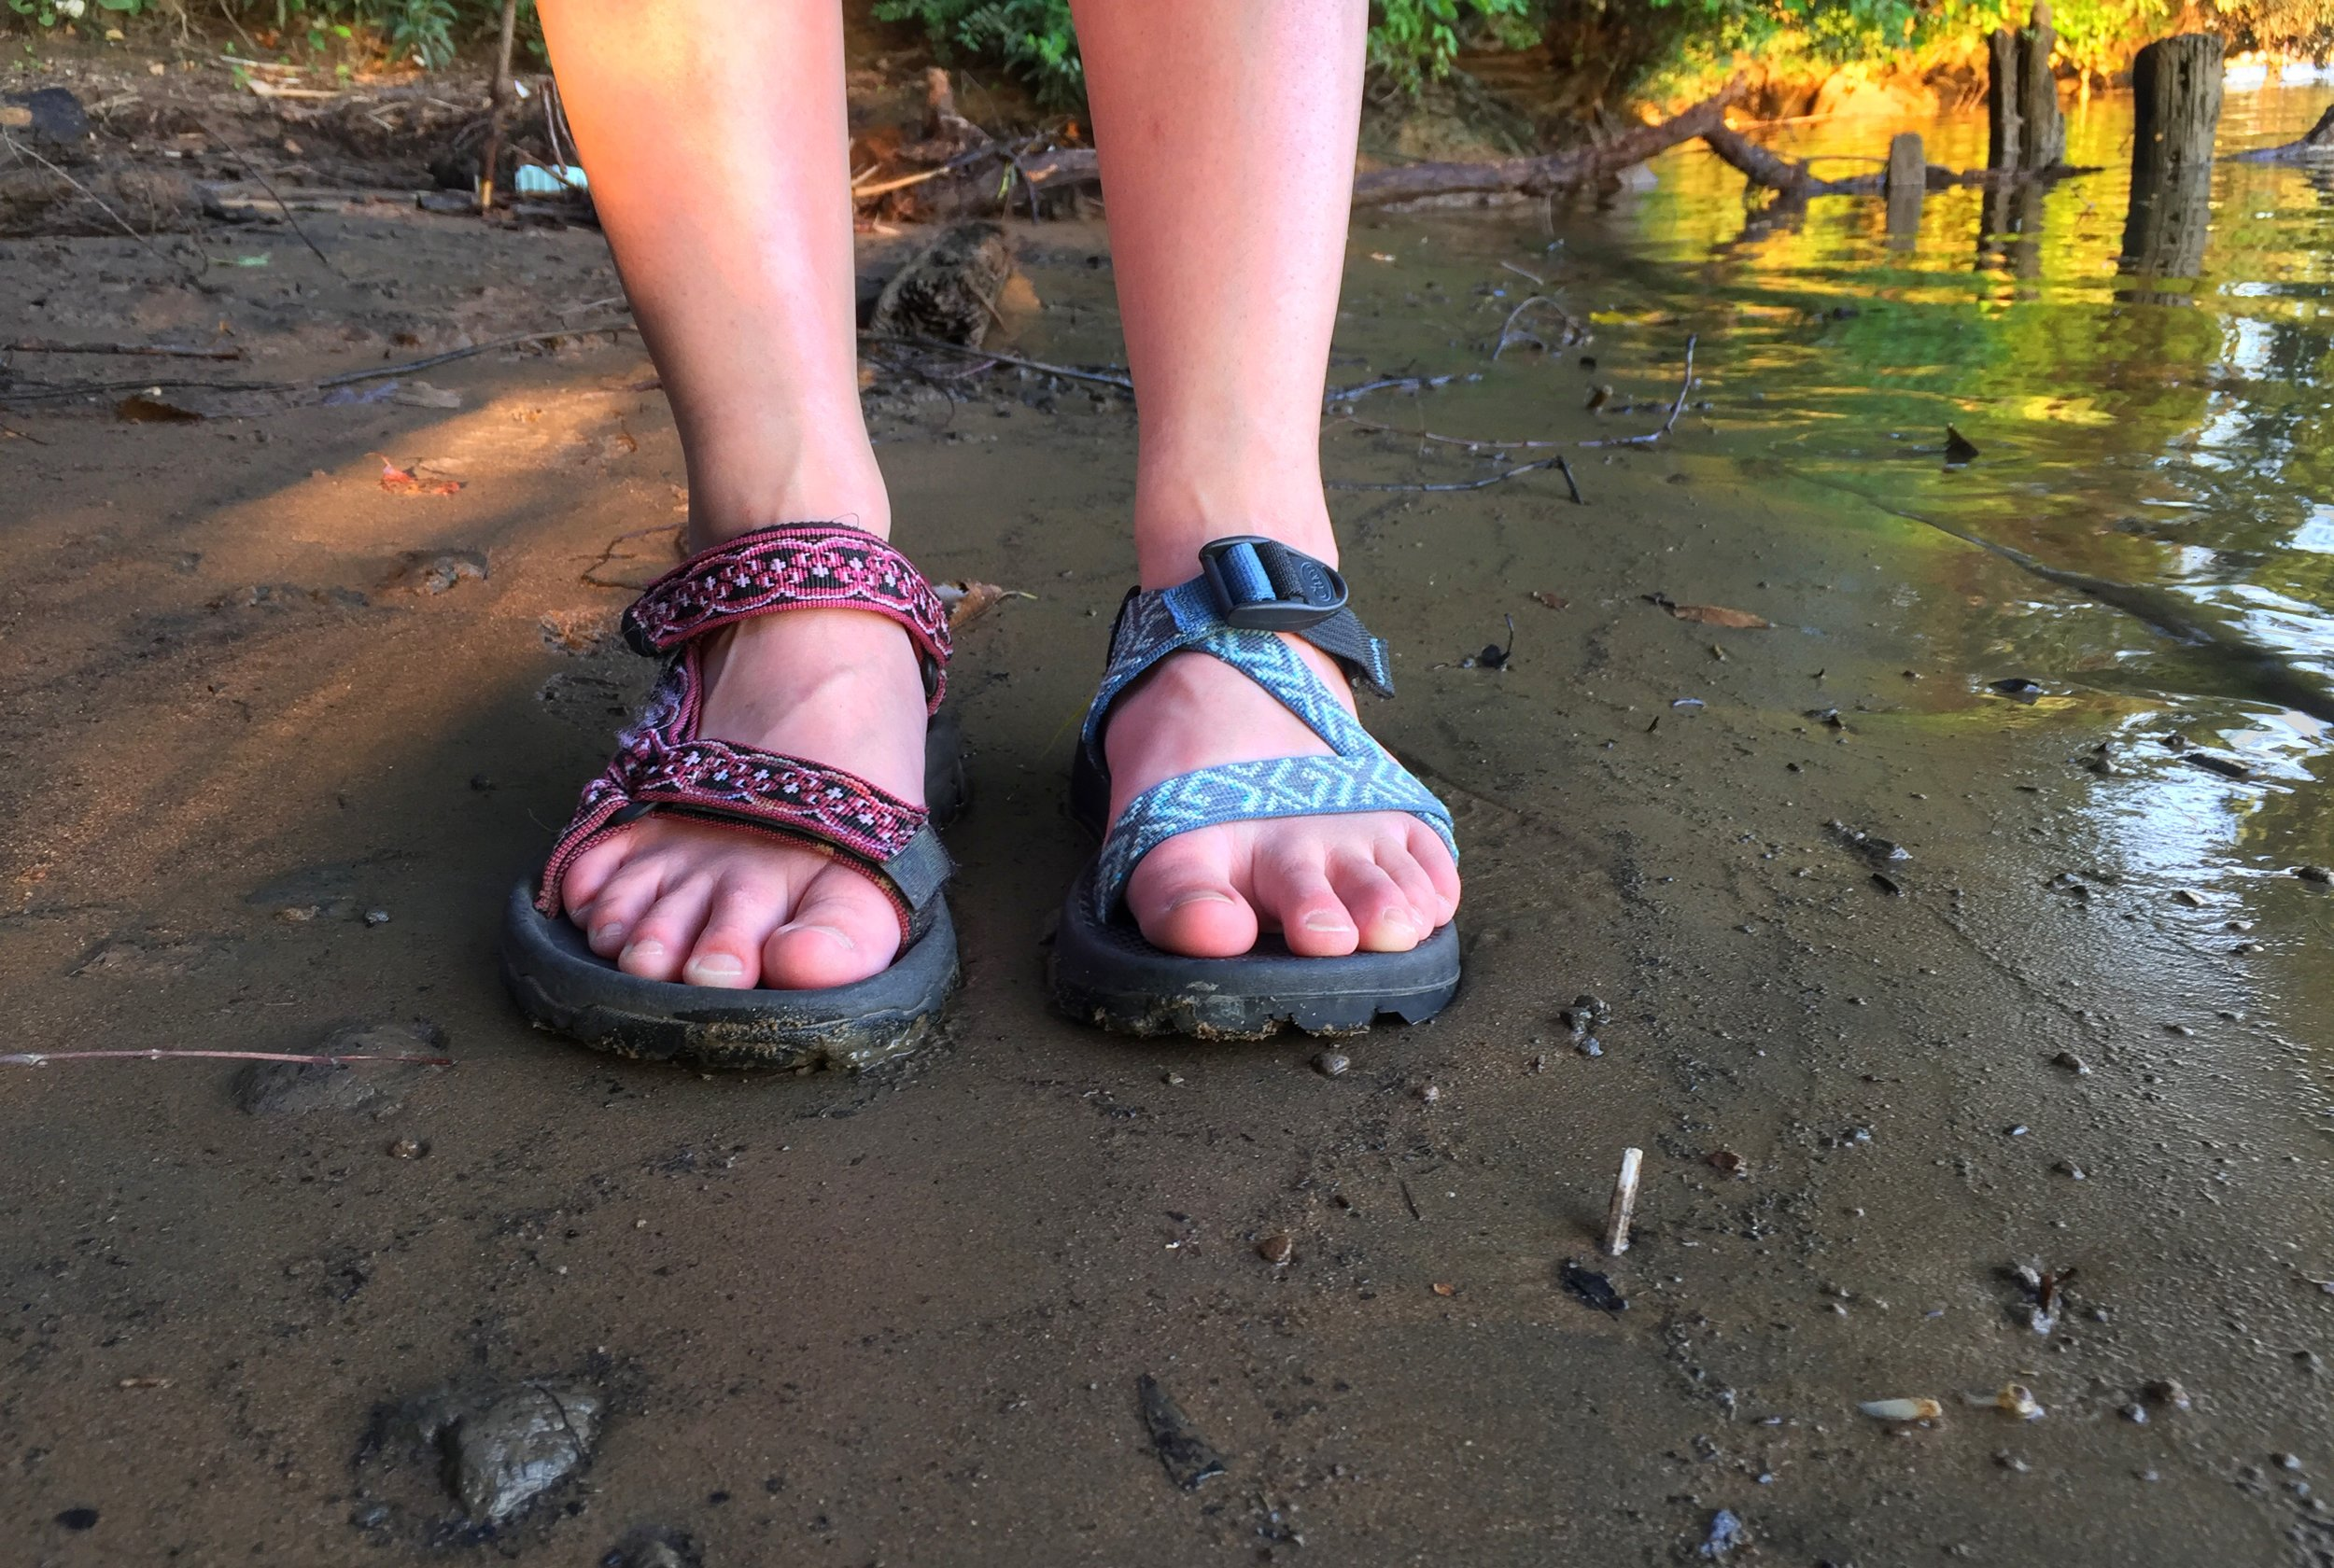 Chaco vs Teva: Who Makes the Better Adventure Sandal? — The